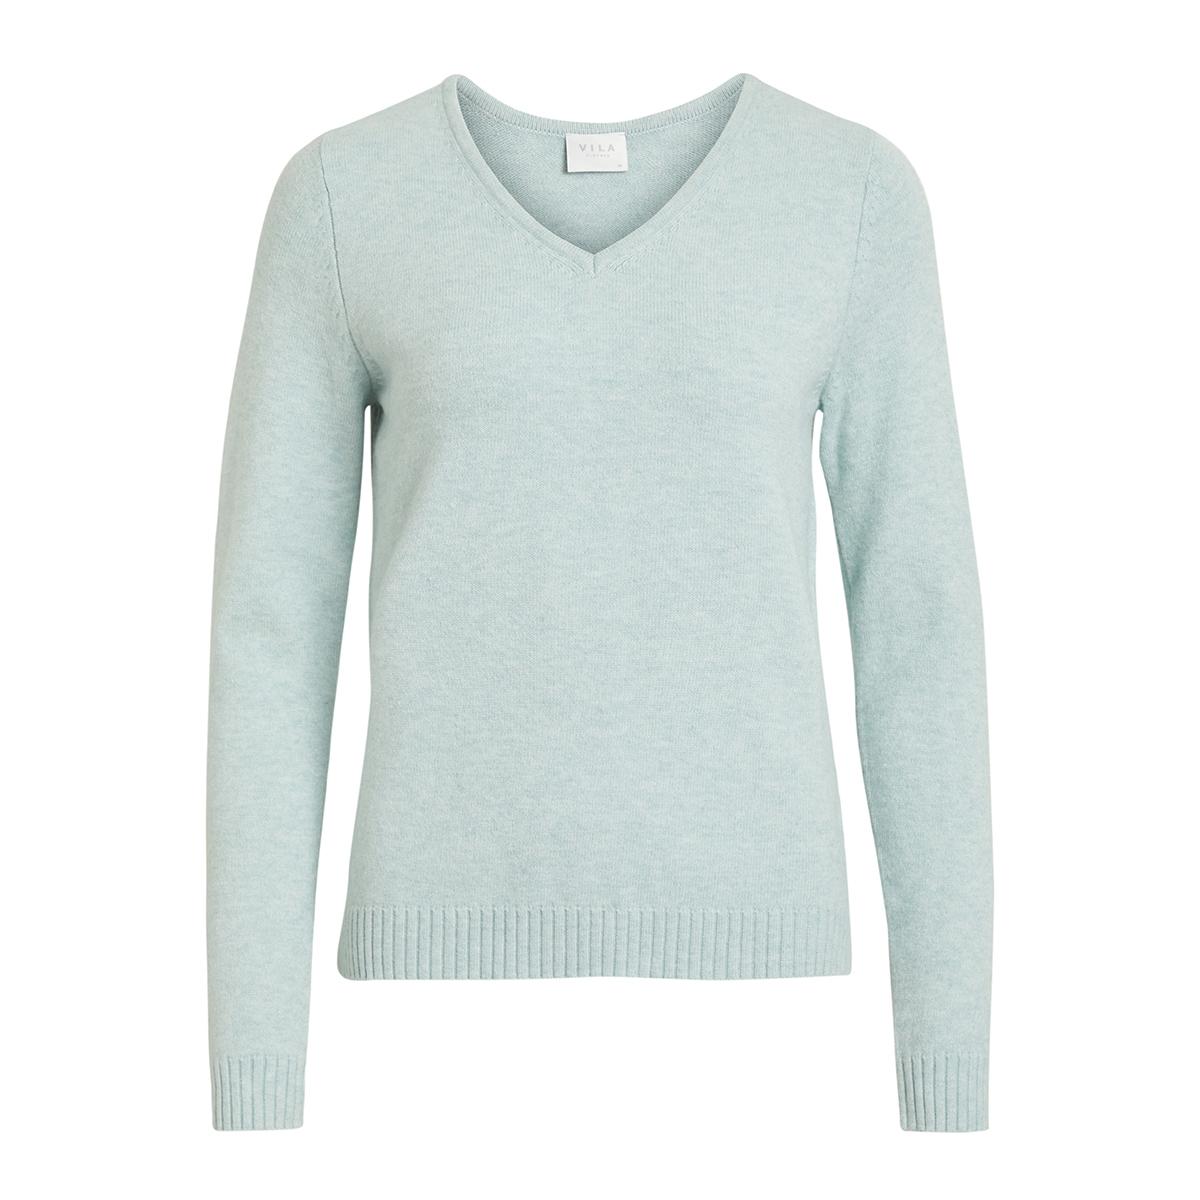 Vila Noos Hazemelange Ls V Neck Trui Blue Top Knit Viril 14042769 xwfOTnq4U0